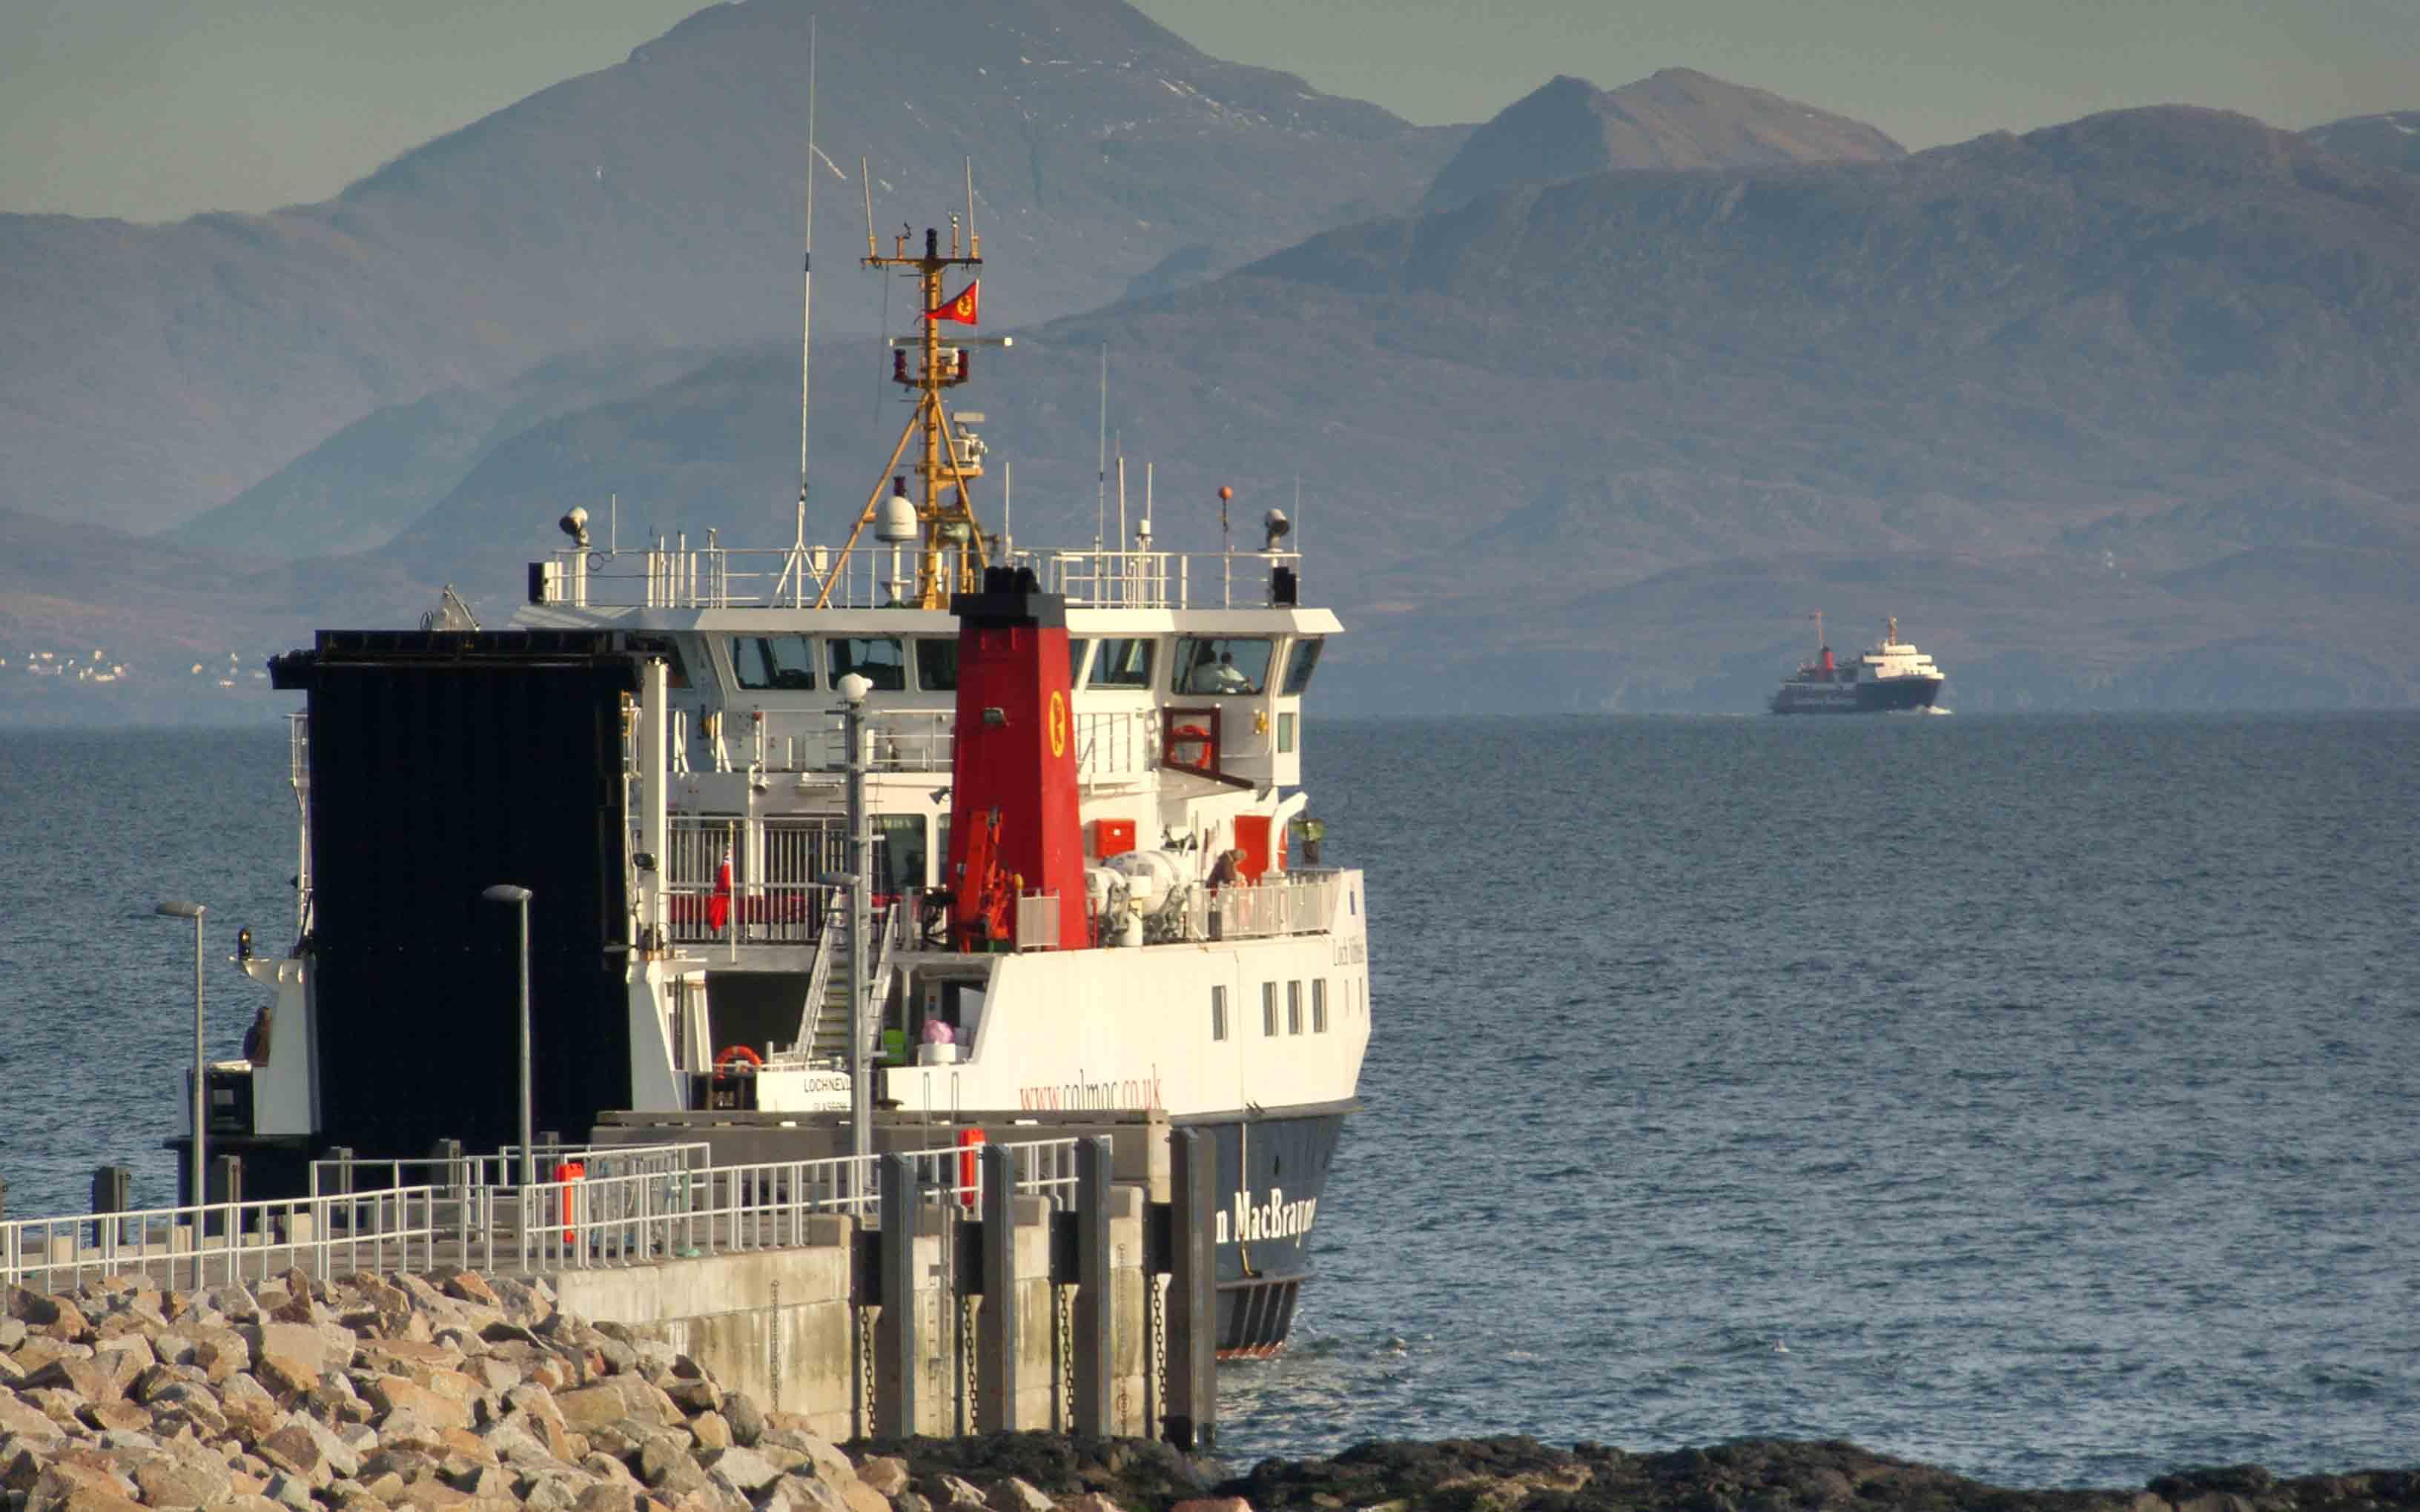 Lochnevis leaving Eigg (Ships of CalMac)